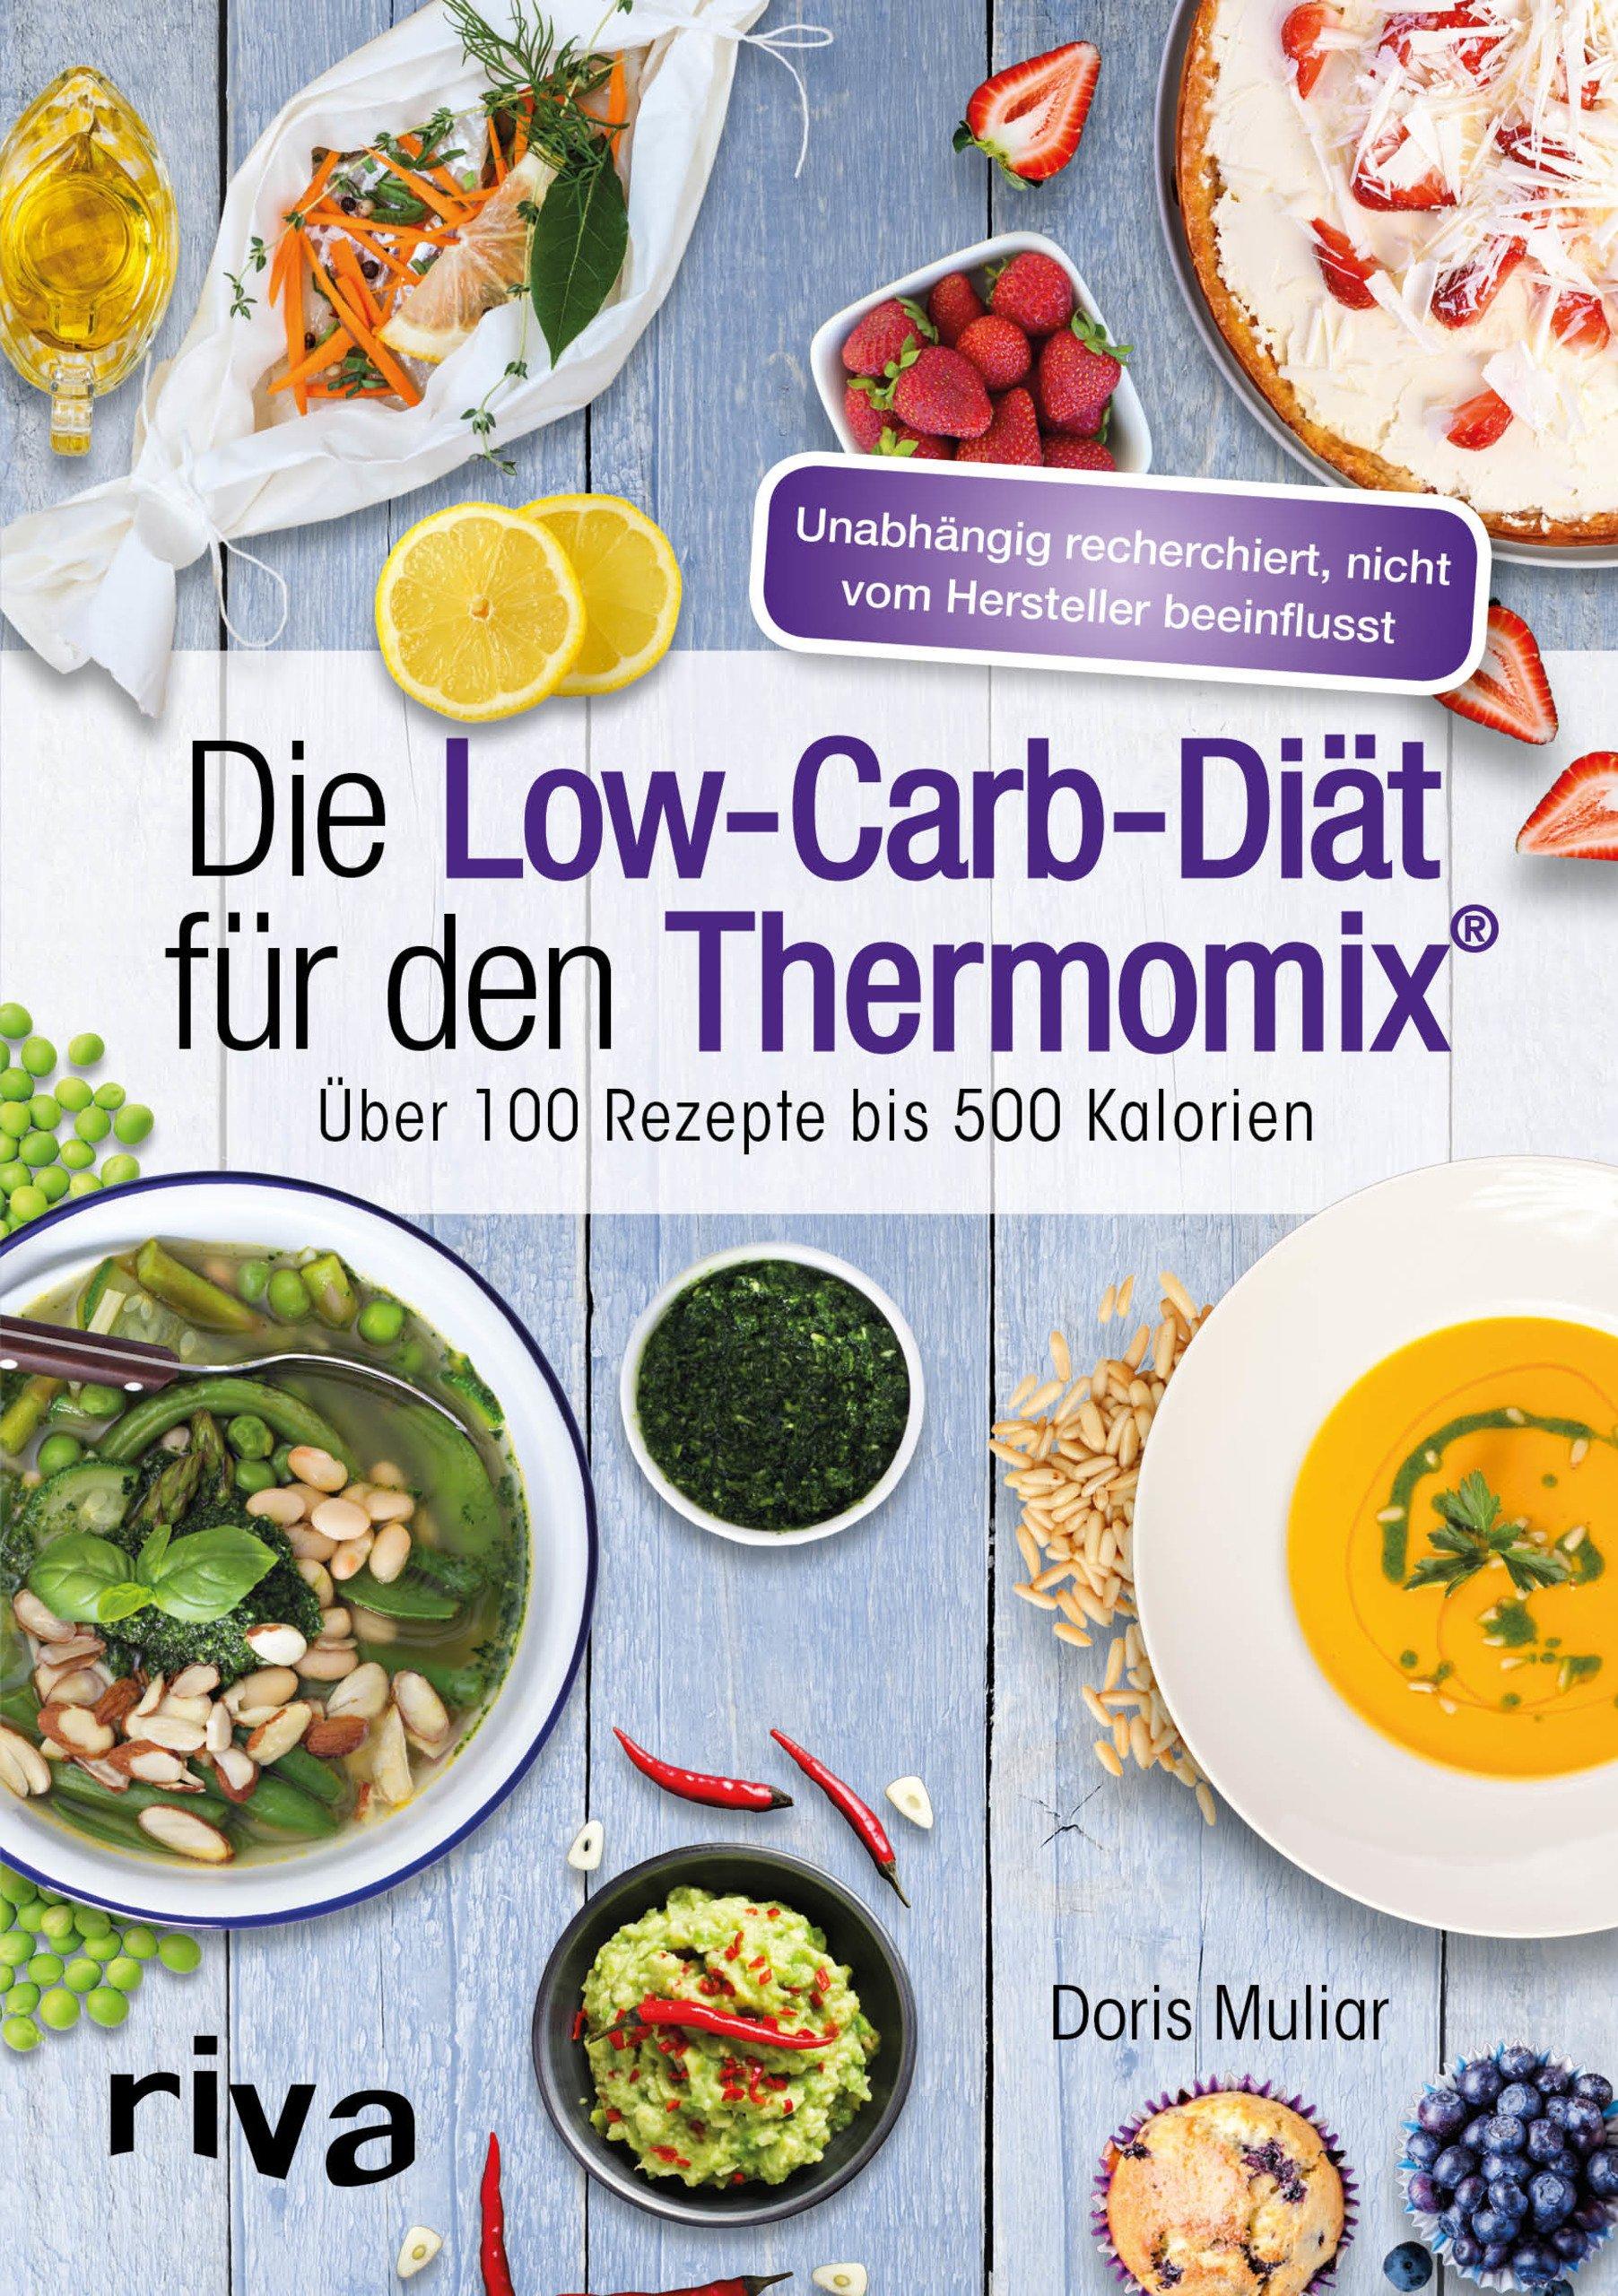 abnehmen mit dem thermomix®: leichte low-carb-küche zum genießen ... - Thermomix Leichte Küche